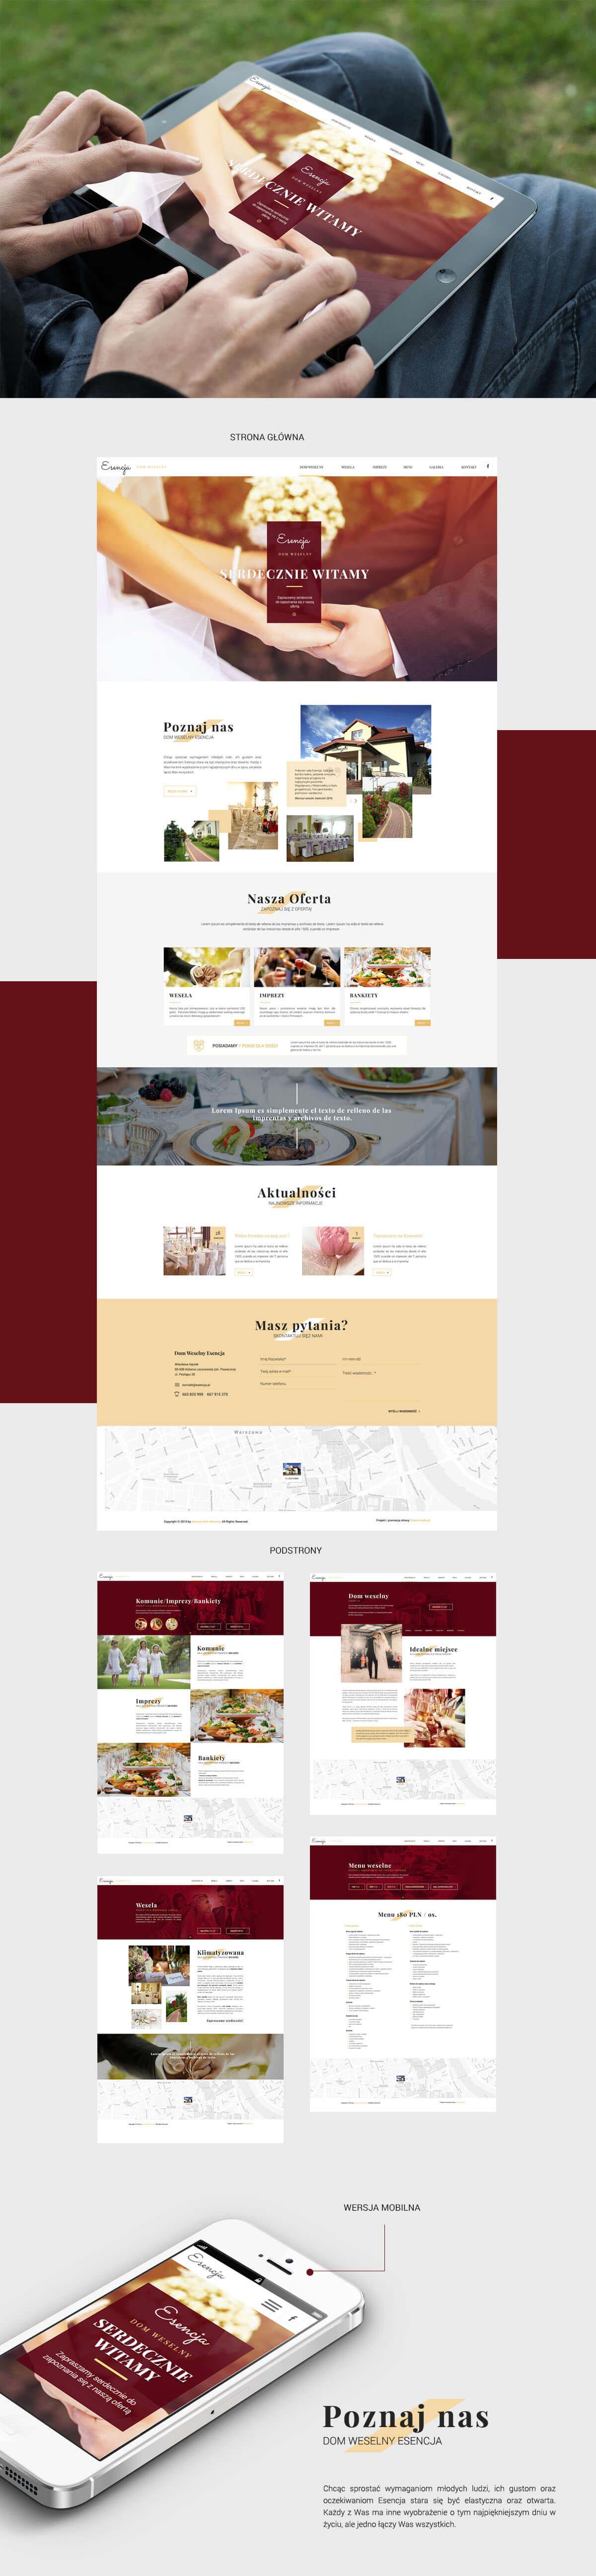 Webdesign design strona www strona internetowa strony www Strony Internetowe Web Design  projects wedding wedding website